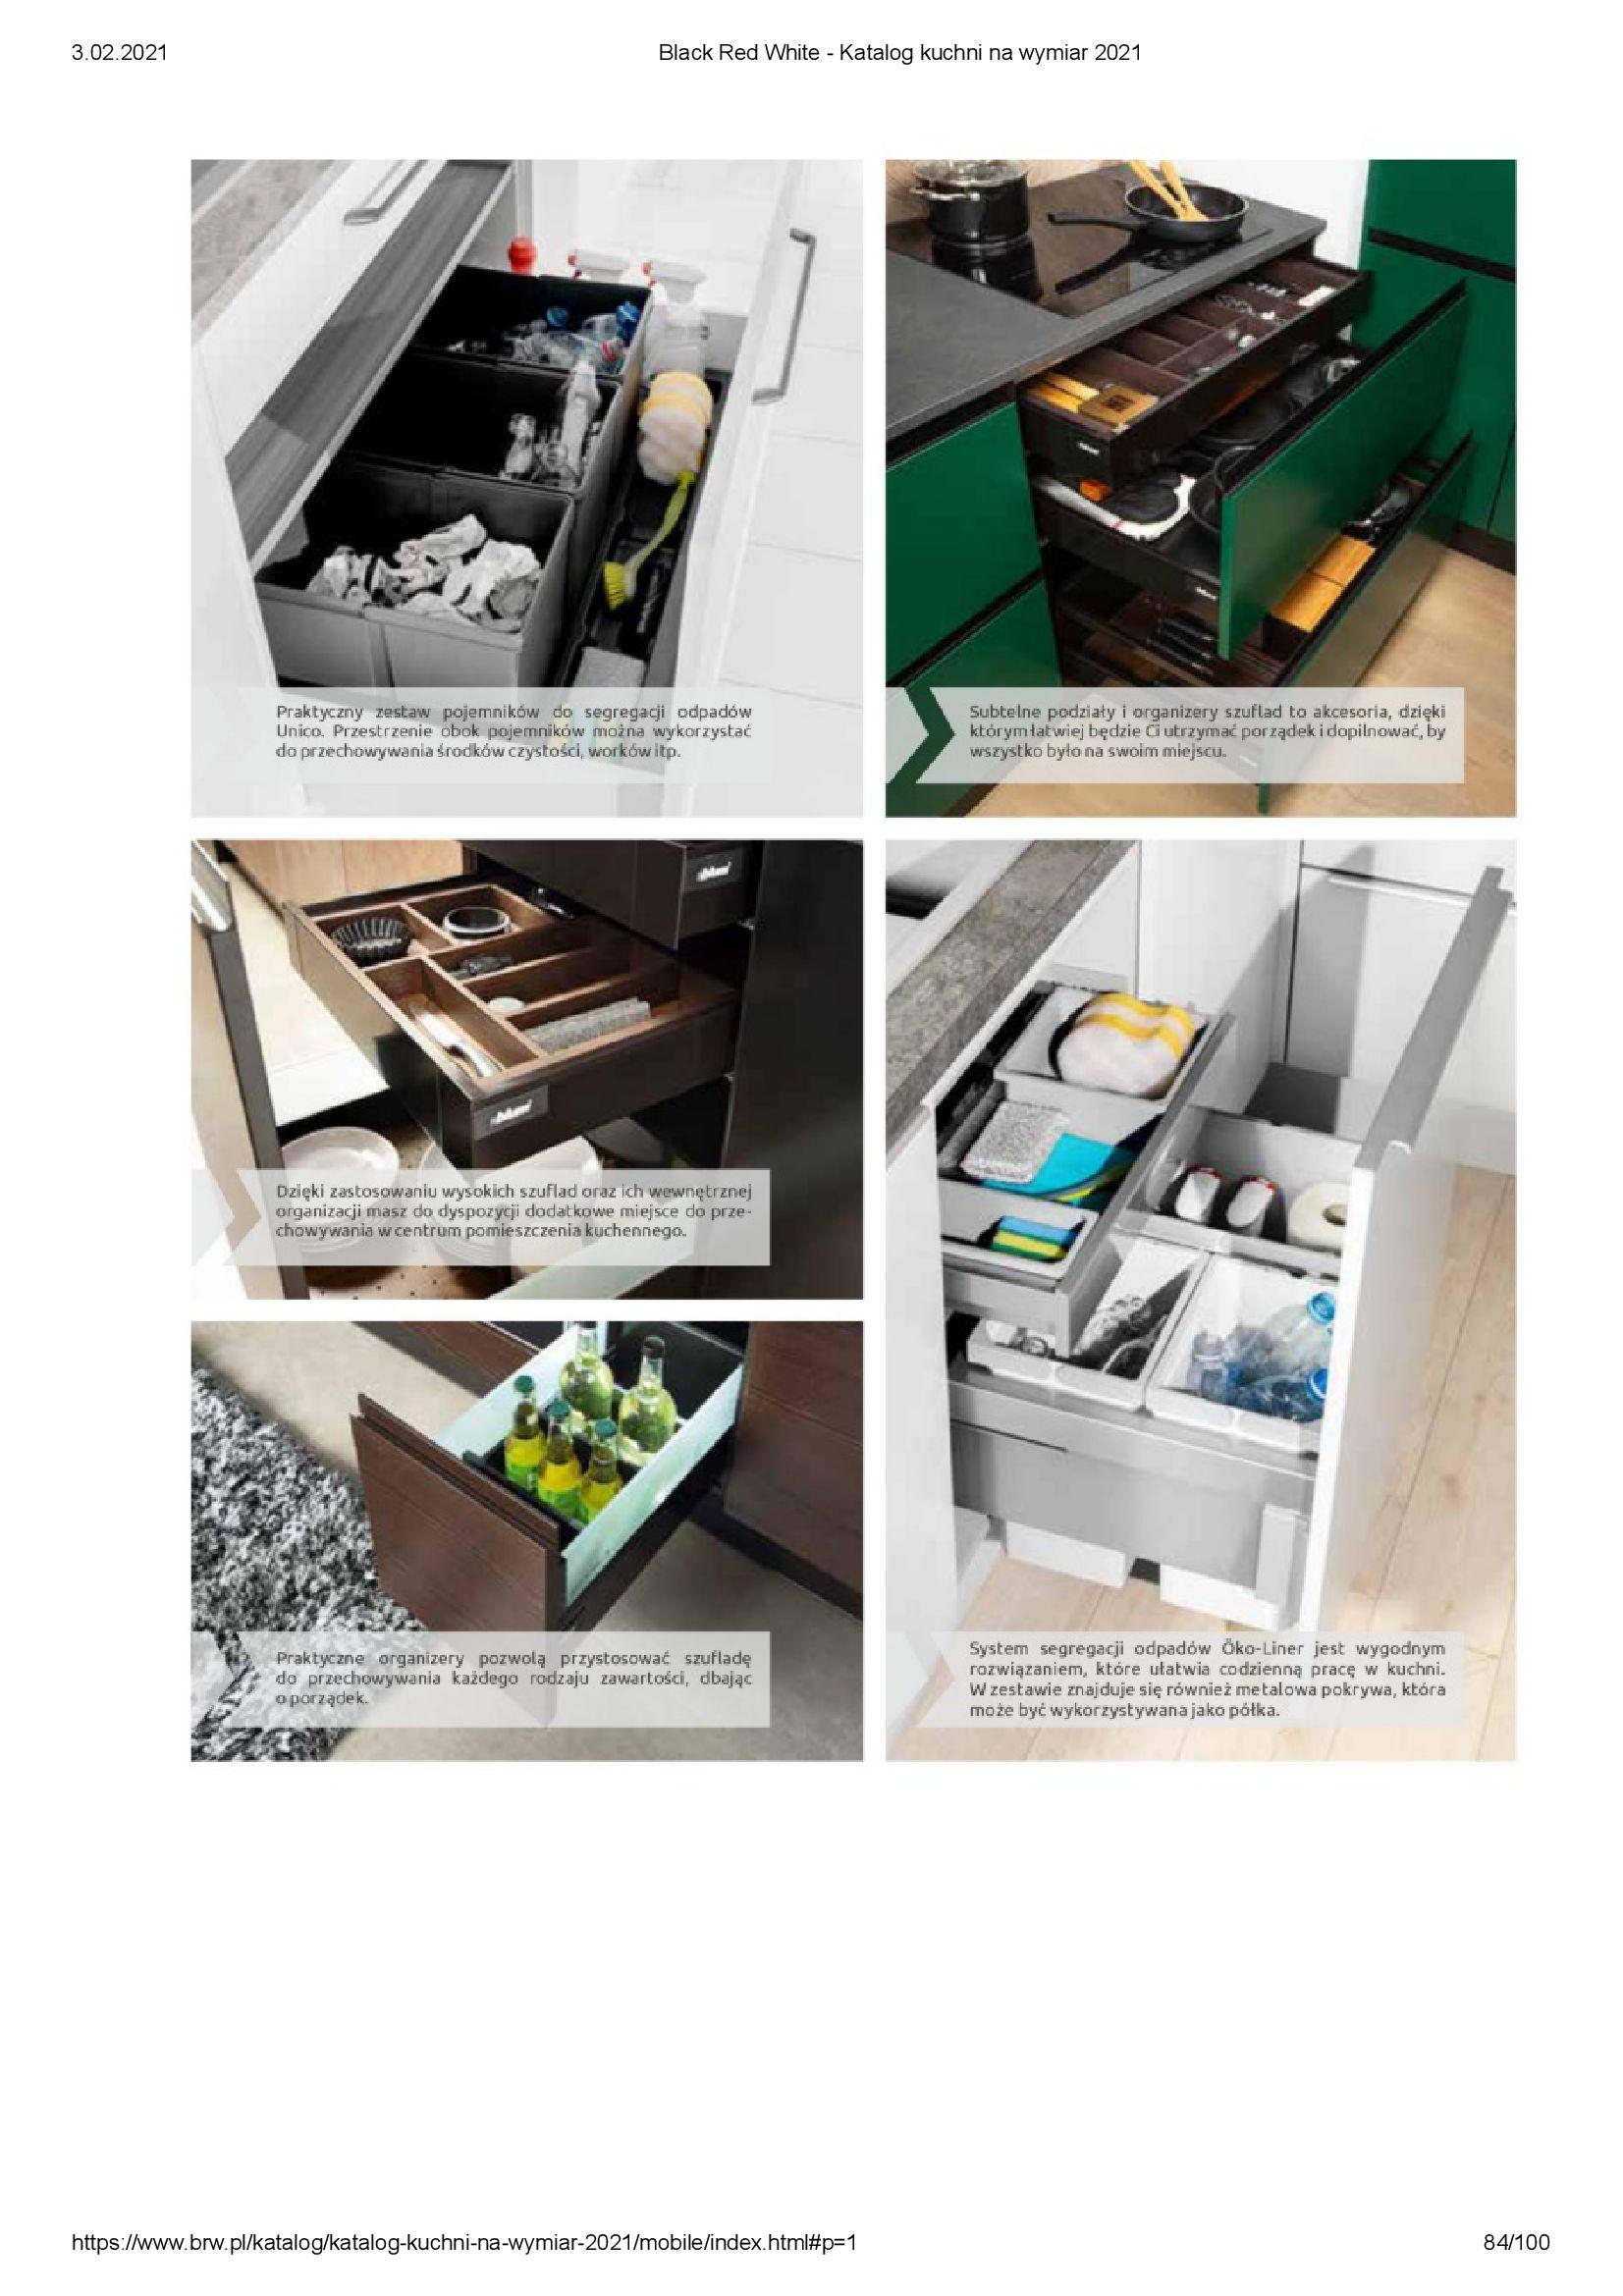 Gazetka Black Red White: Katalog - Kuchnie na wymiar Senso Kitchens 2021 2021-01-01 page-84